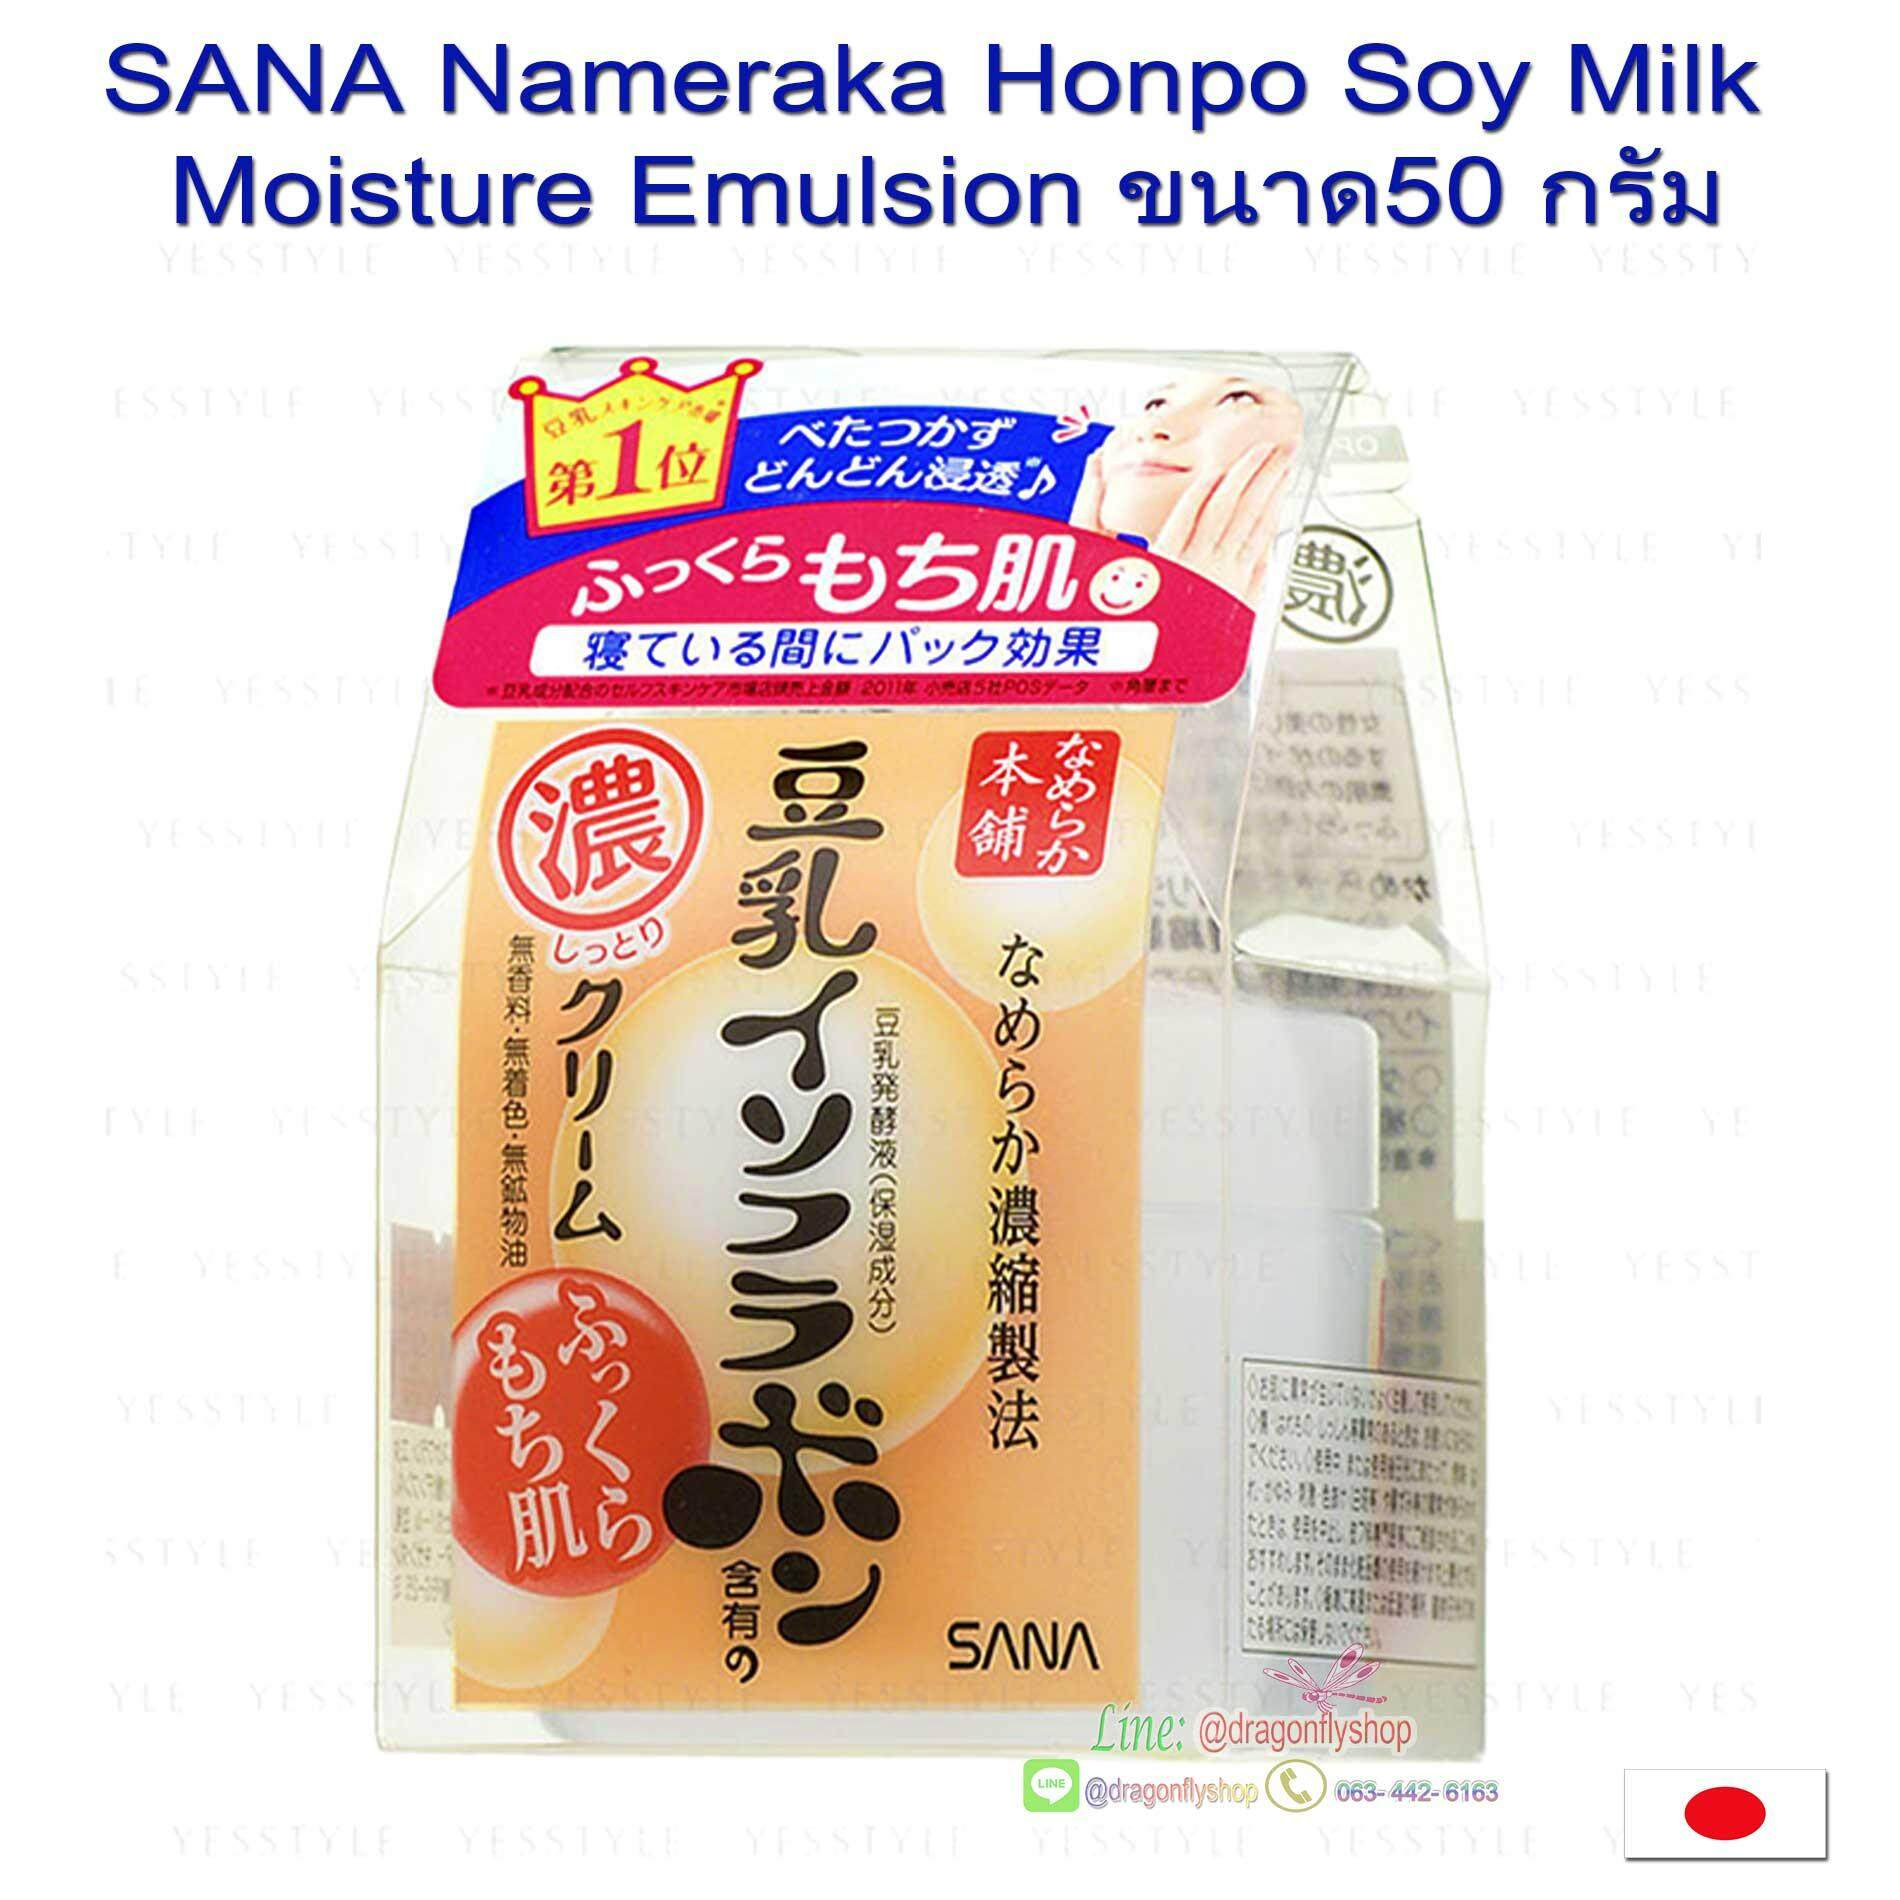 Sana Nameraka Honpo Soy Milk Moisture Emulsion 50g..